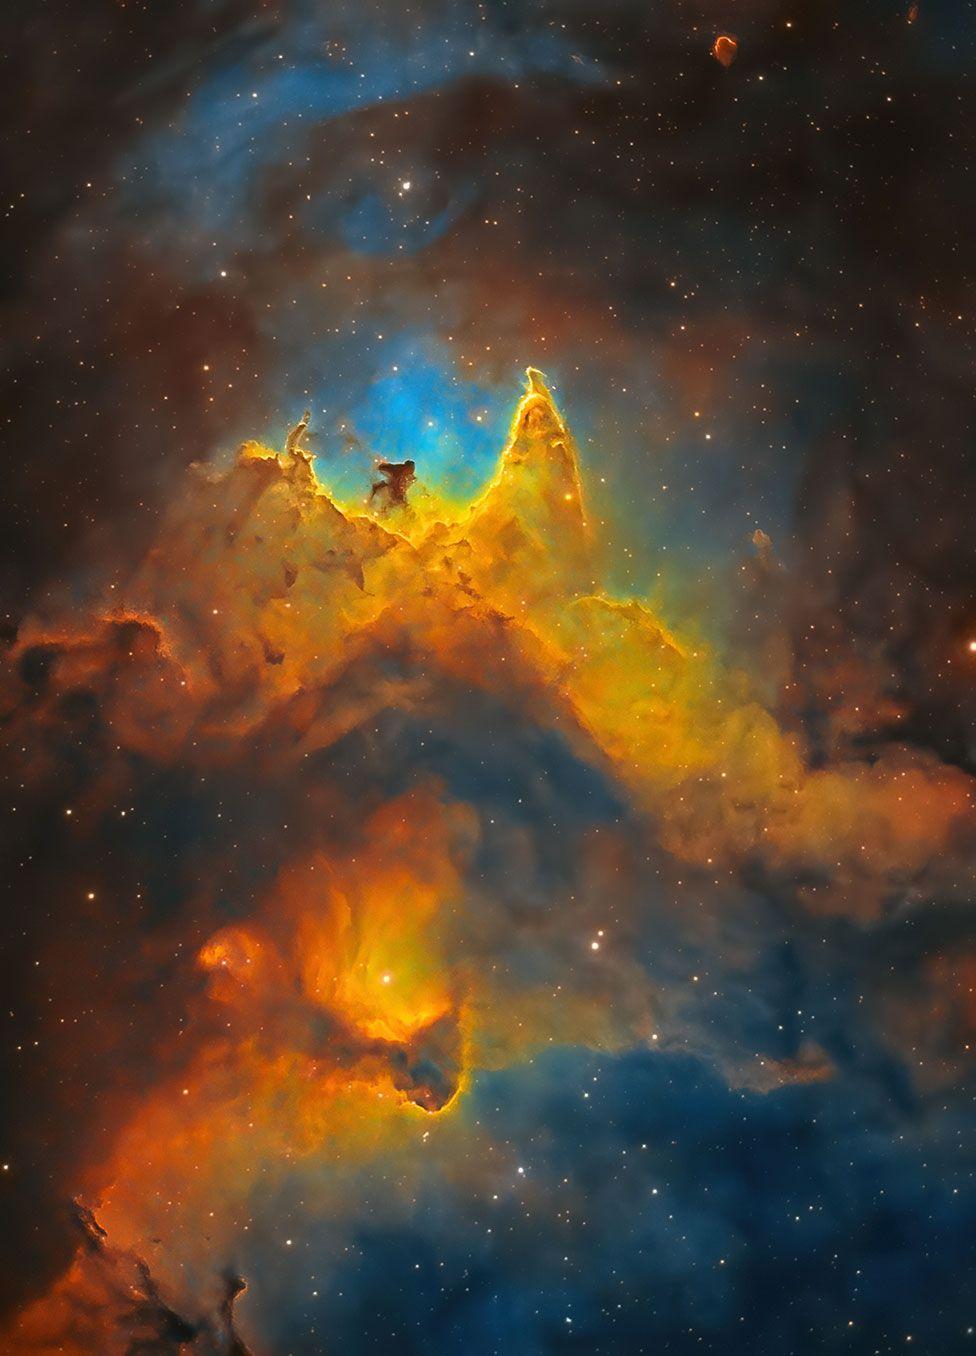 Крупный план туманности «Душа». Фото — Куш Чандария из Великобритании.